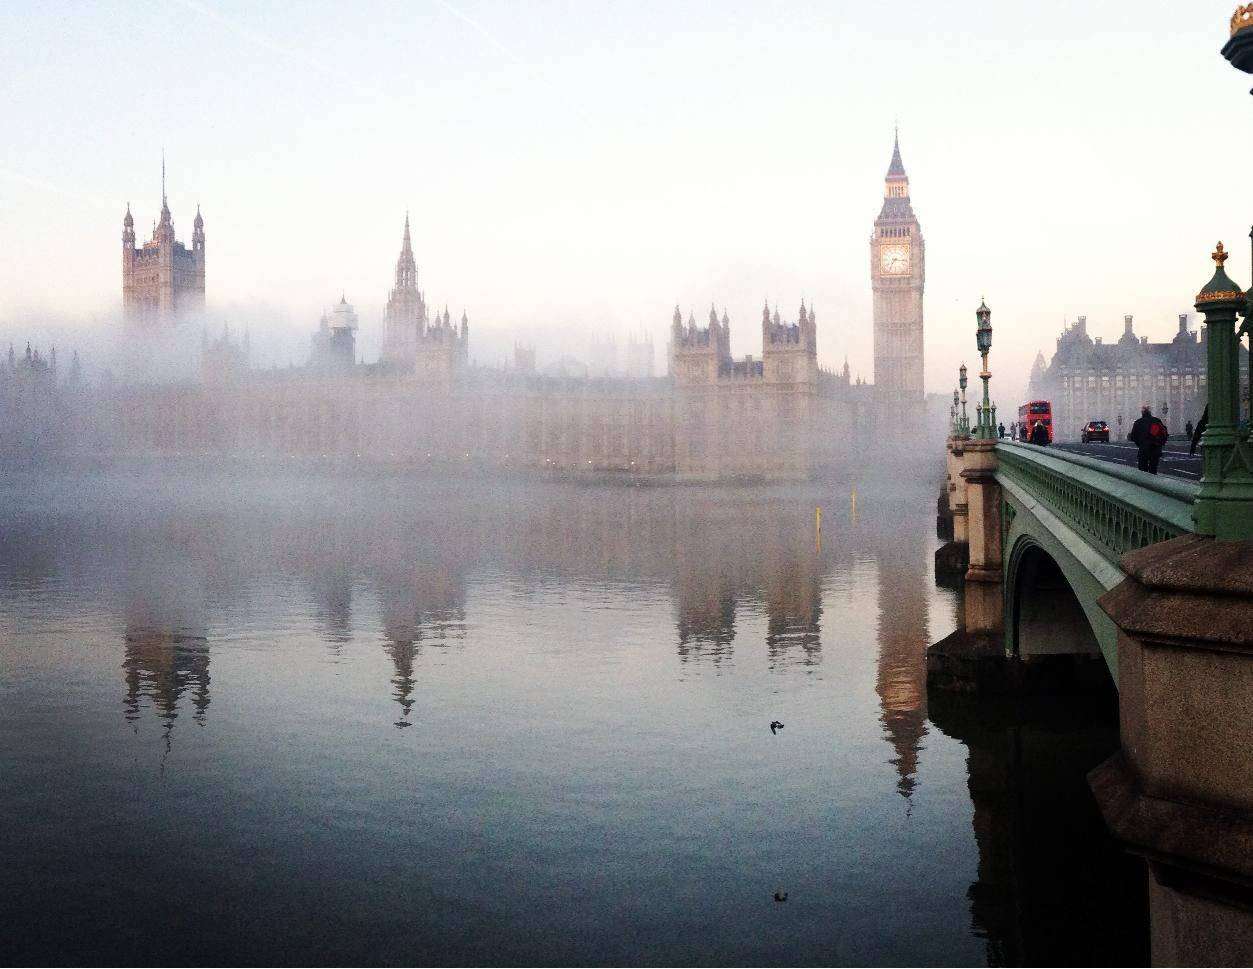 солнца русской туман в англии фото нужна дополнительная рамка